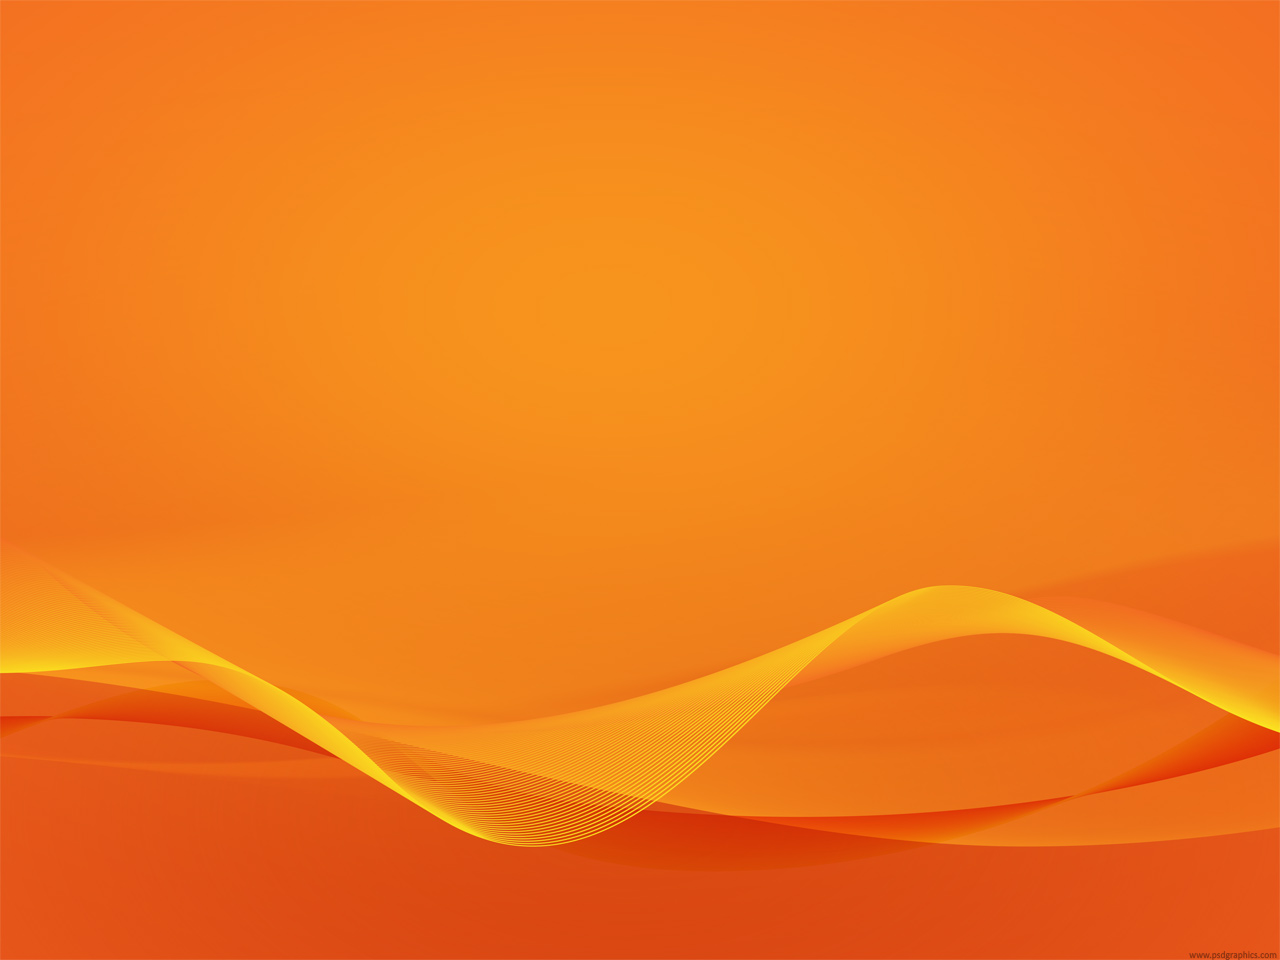 Medium size preview 1280x960px Wavy orange design 1280x960